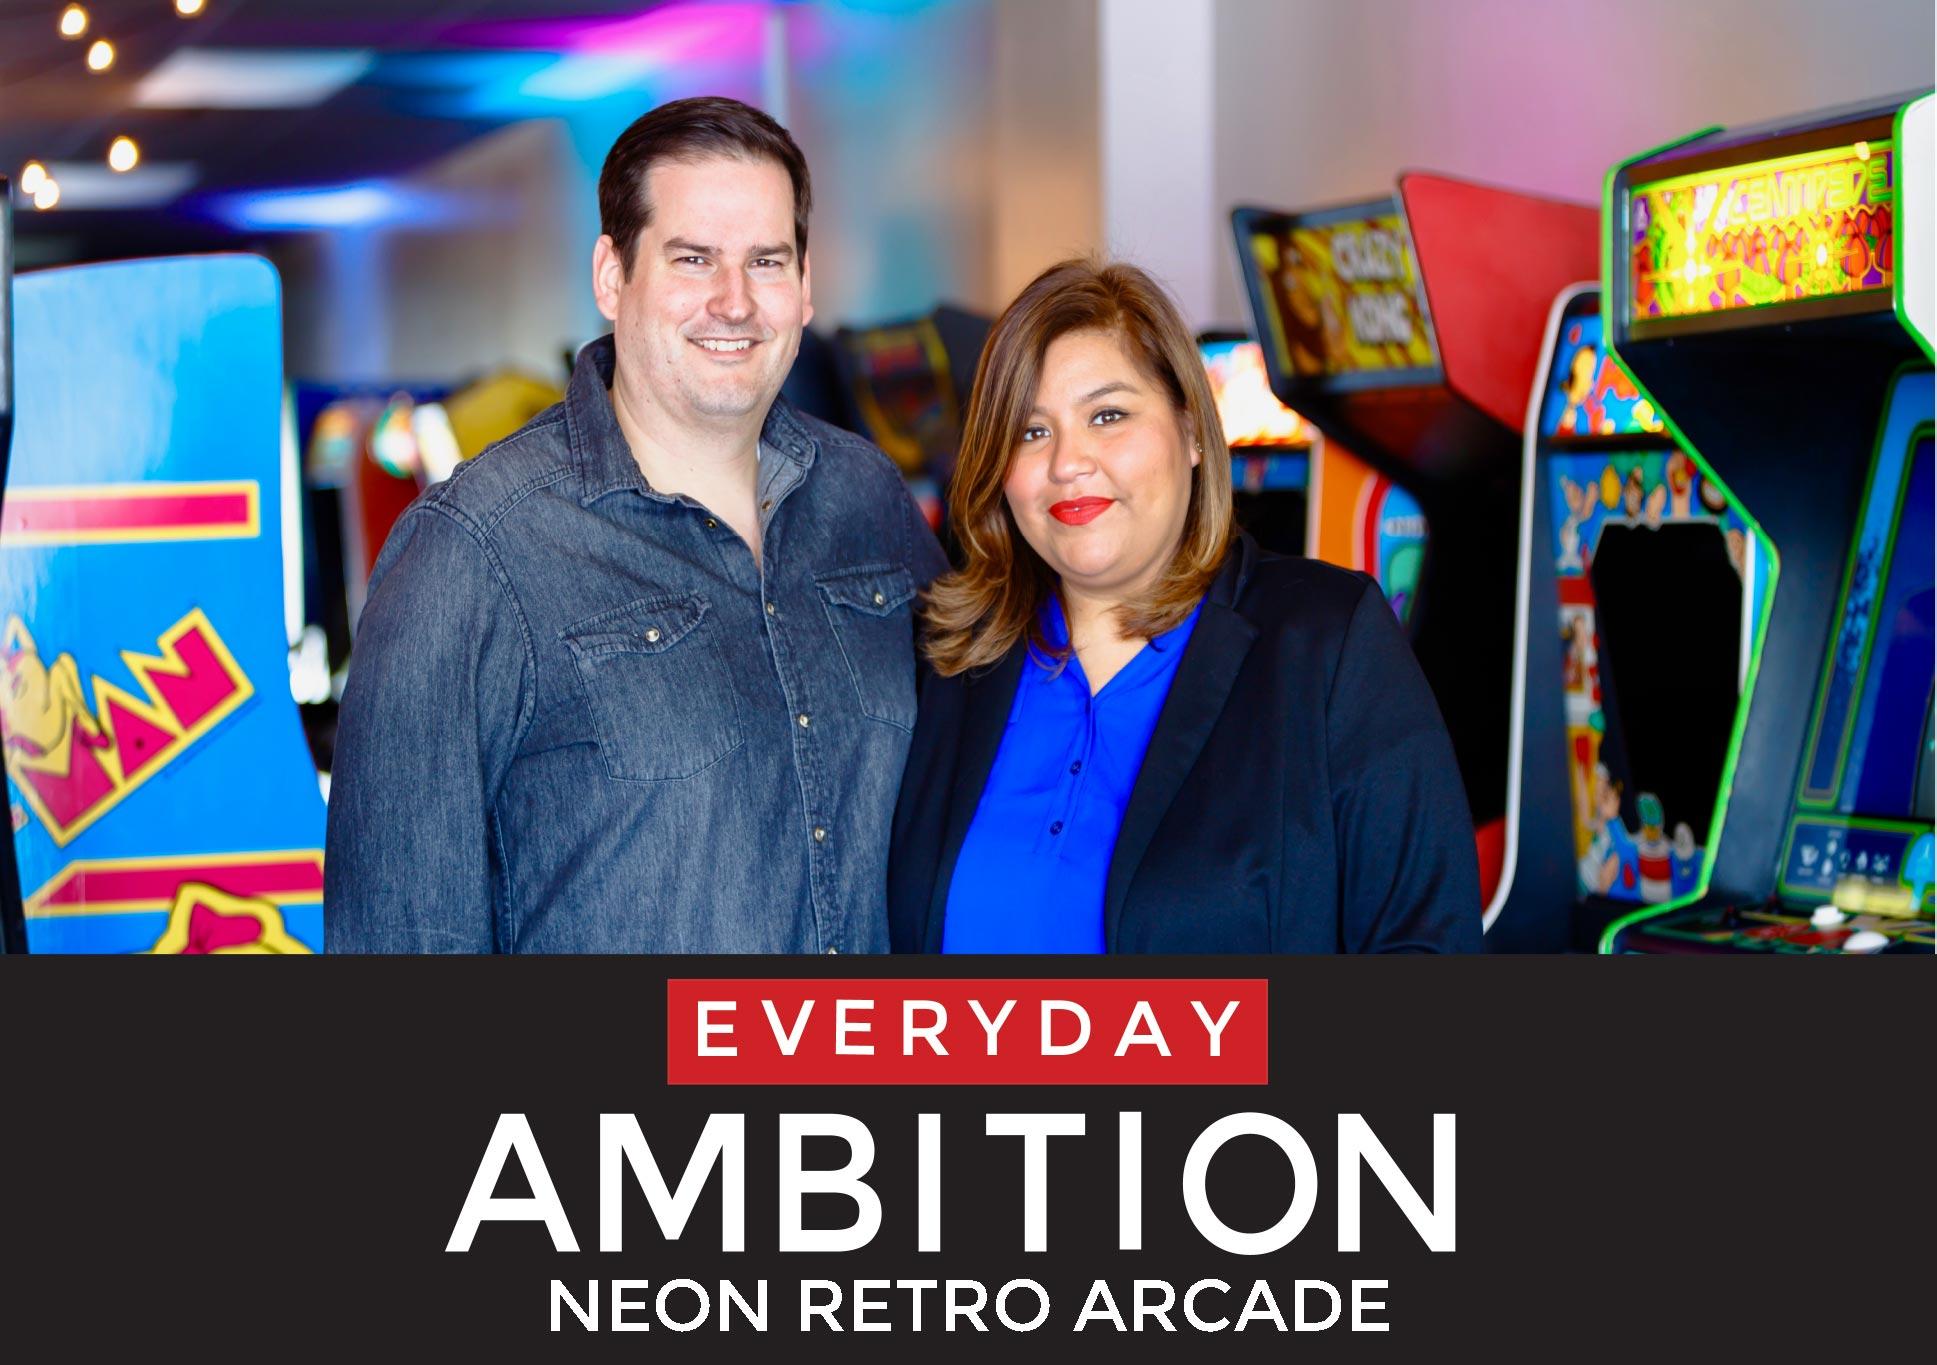 Neon Retro Arcade_with text bottom.jpg